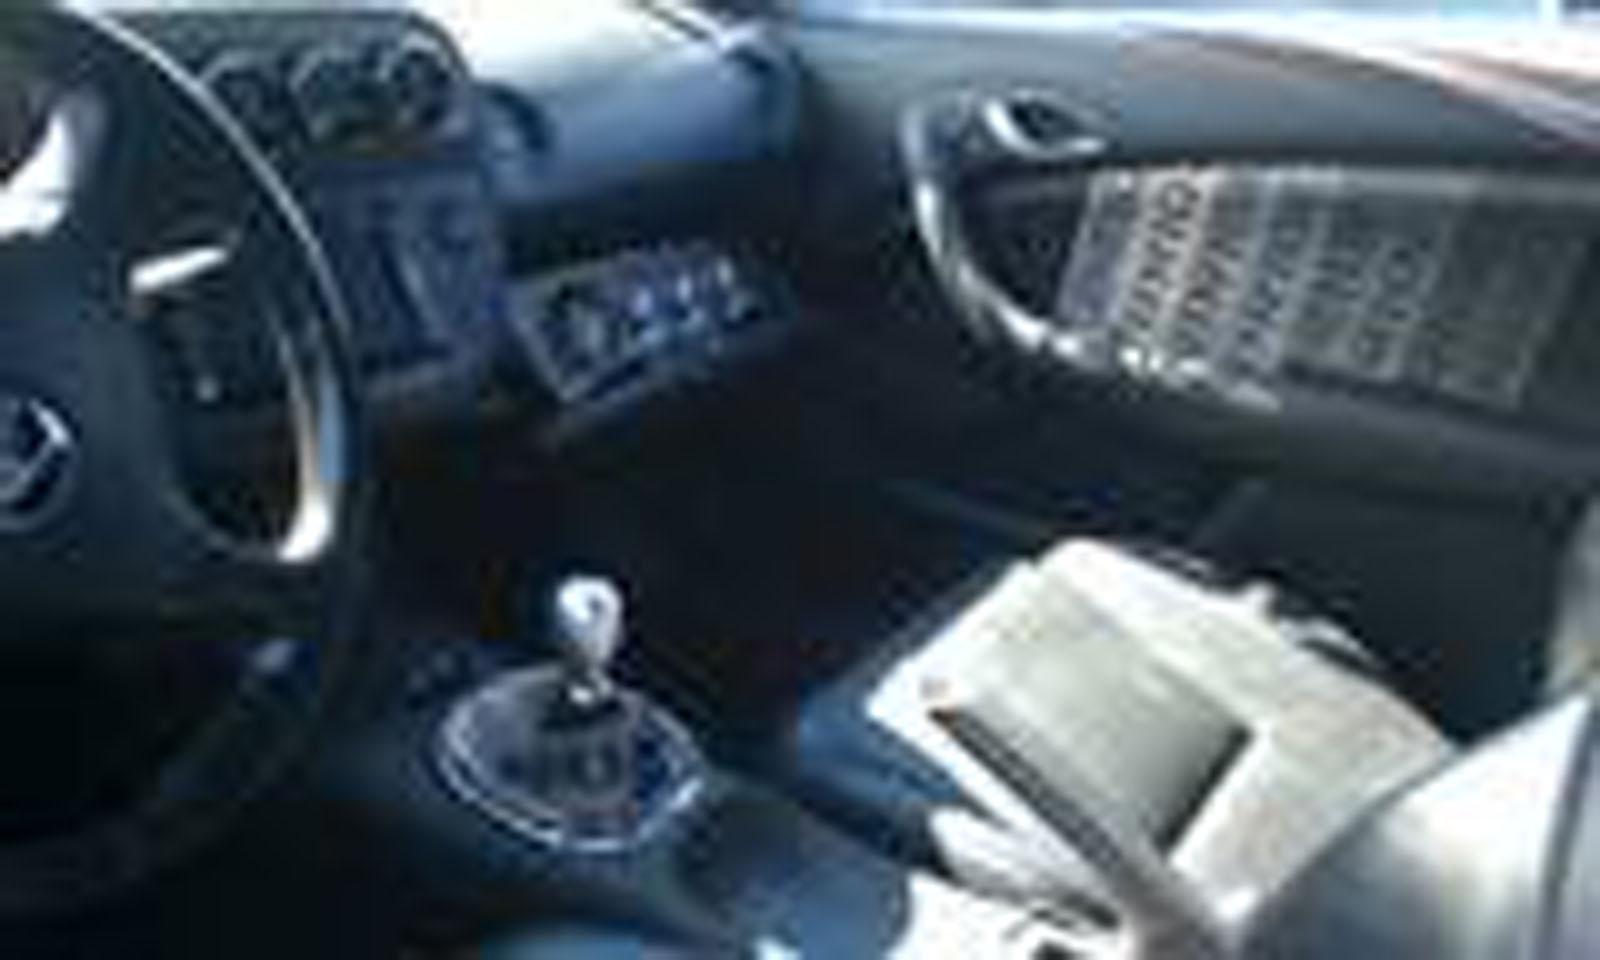 2005 Acura Integra Rsx Type S Turbo For Sale Orlando Florida